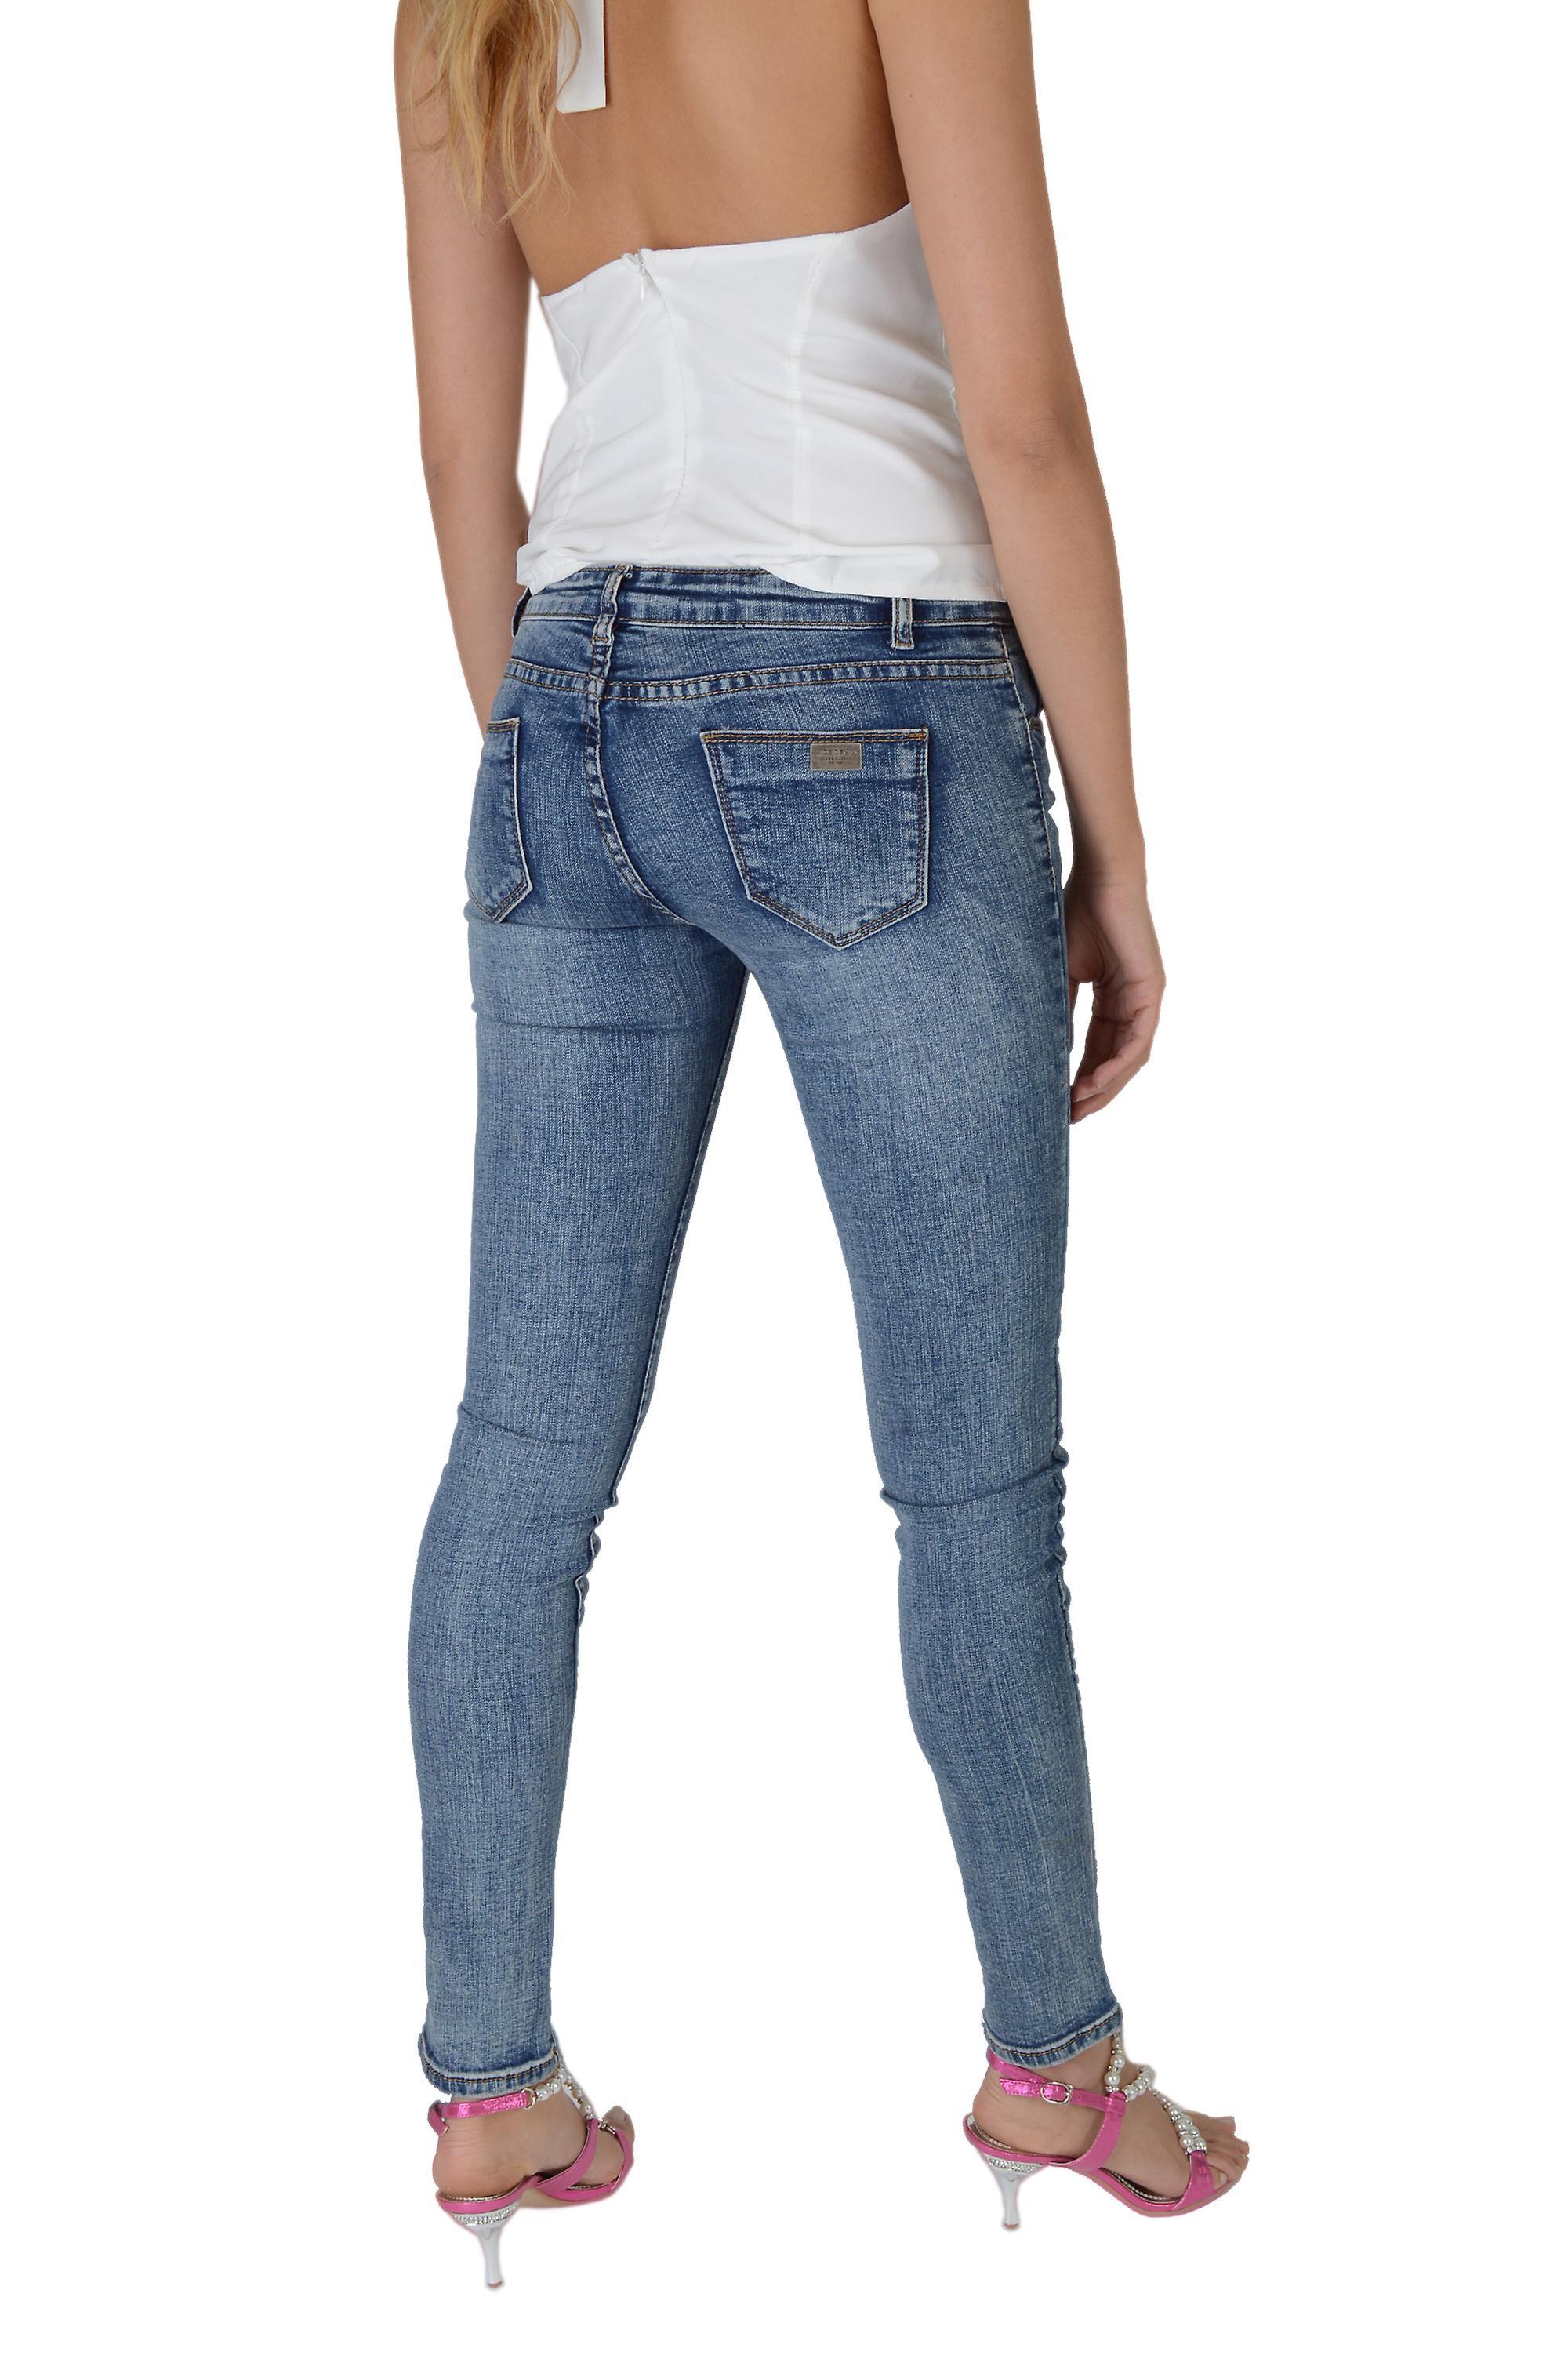 Lovemystyle Acid Wash Skinny Leg Blue Low Rise Jeans